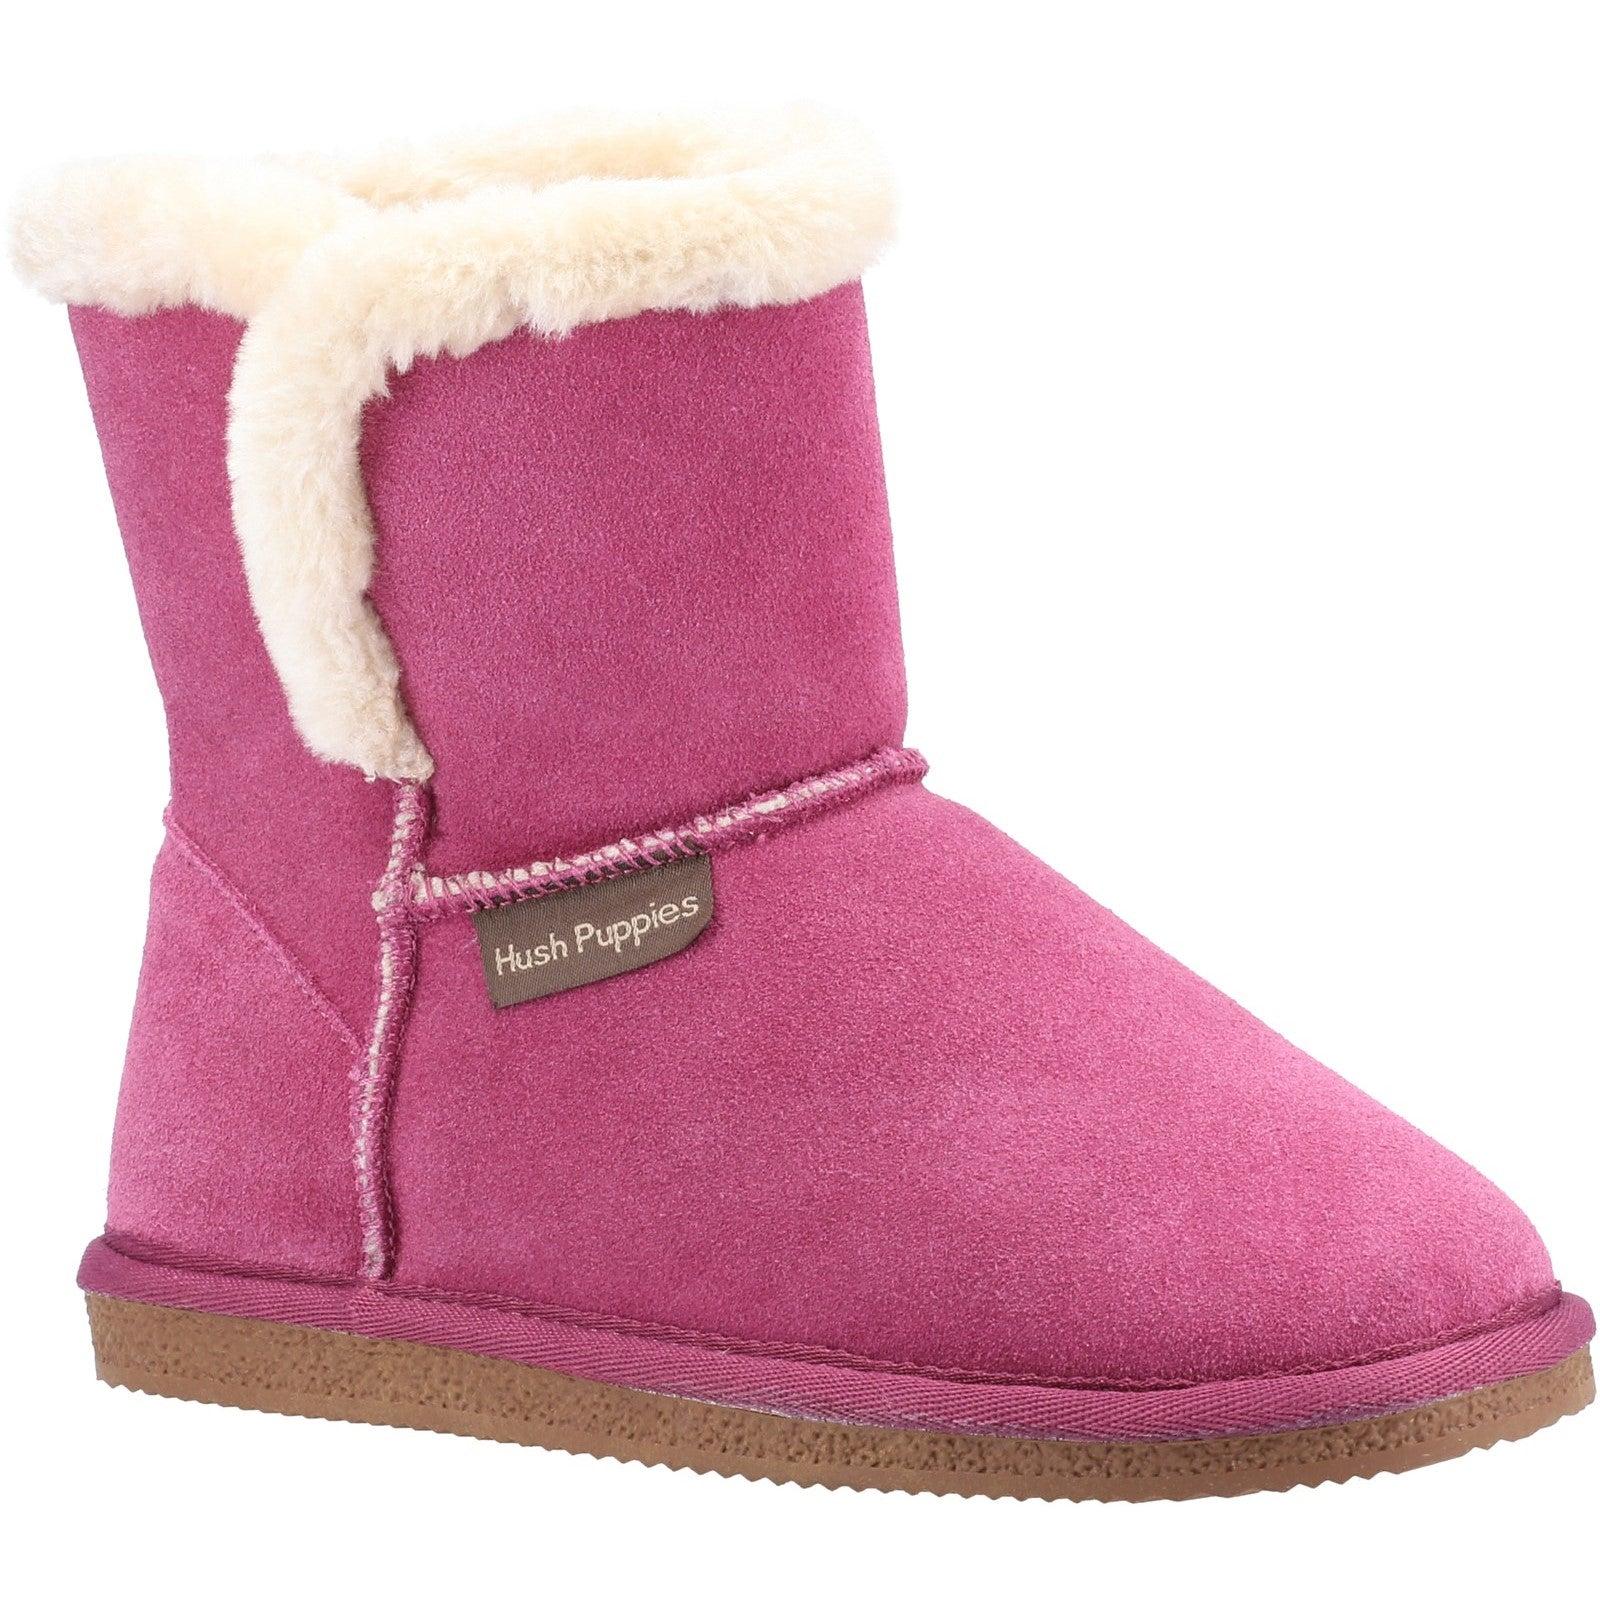 Skechers Womens/Ladies Ashleigh Suede Slipper Boots (8 UK) (Tan)